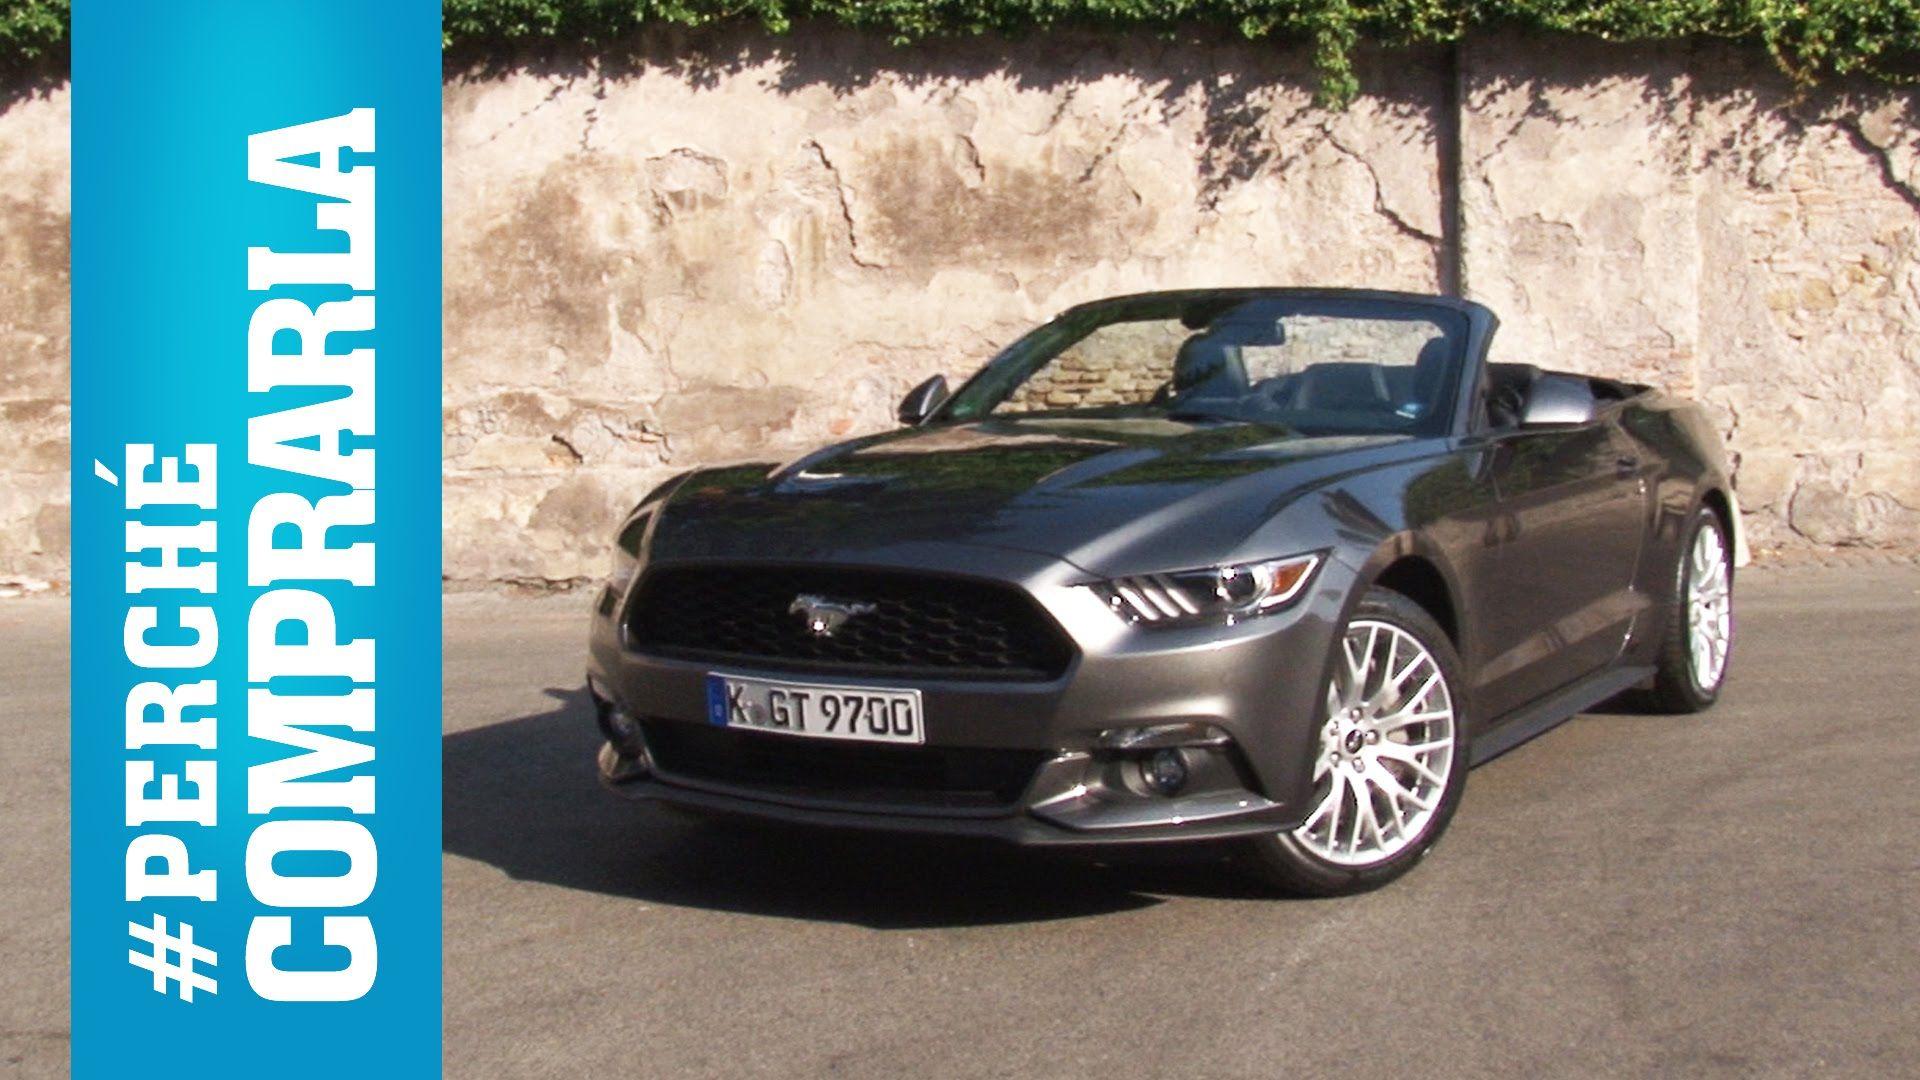 Ford Mustang Convertible 2.3 EcoBoost (2015)   Perchè comprarla... e per...